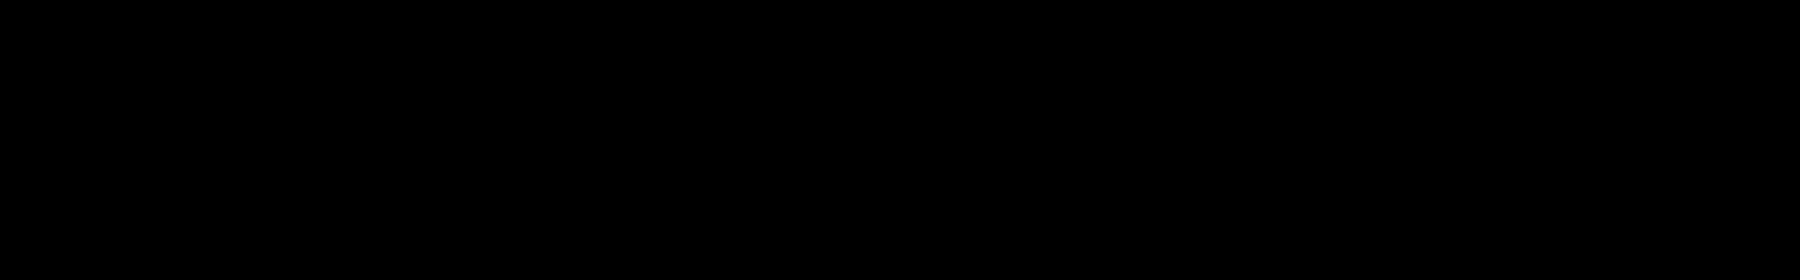 Torii 4 - Lofi Beats audio waveform